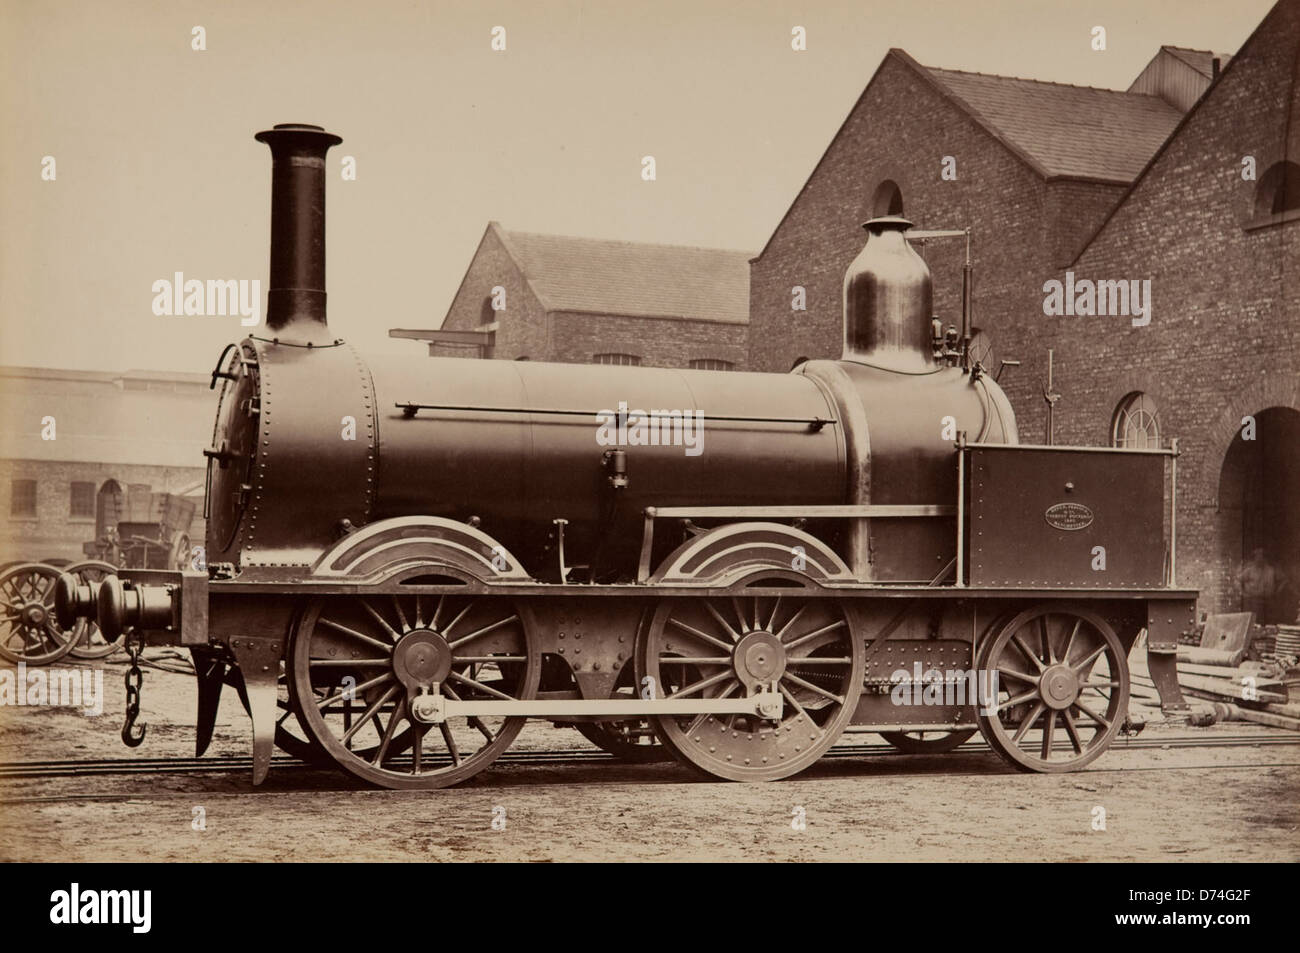 Madras Railway Engine - Stock Image